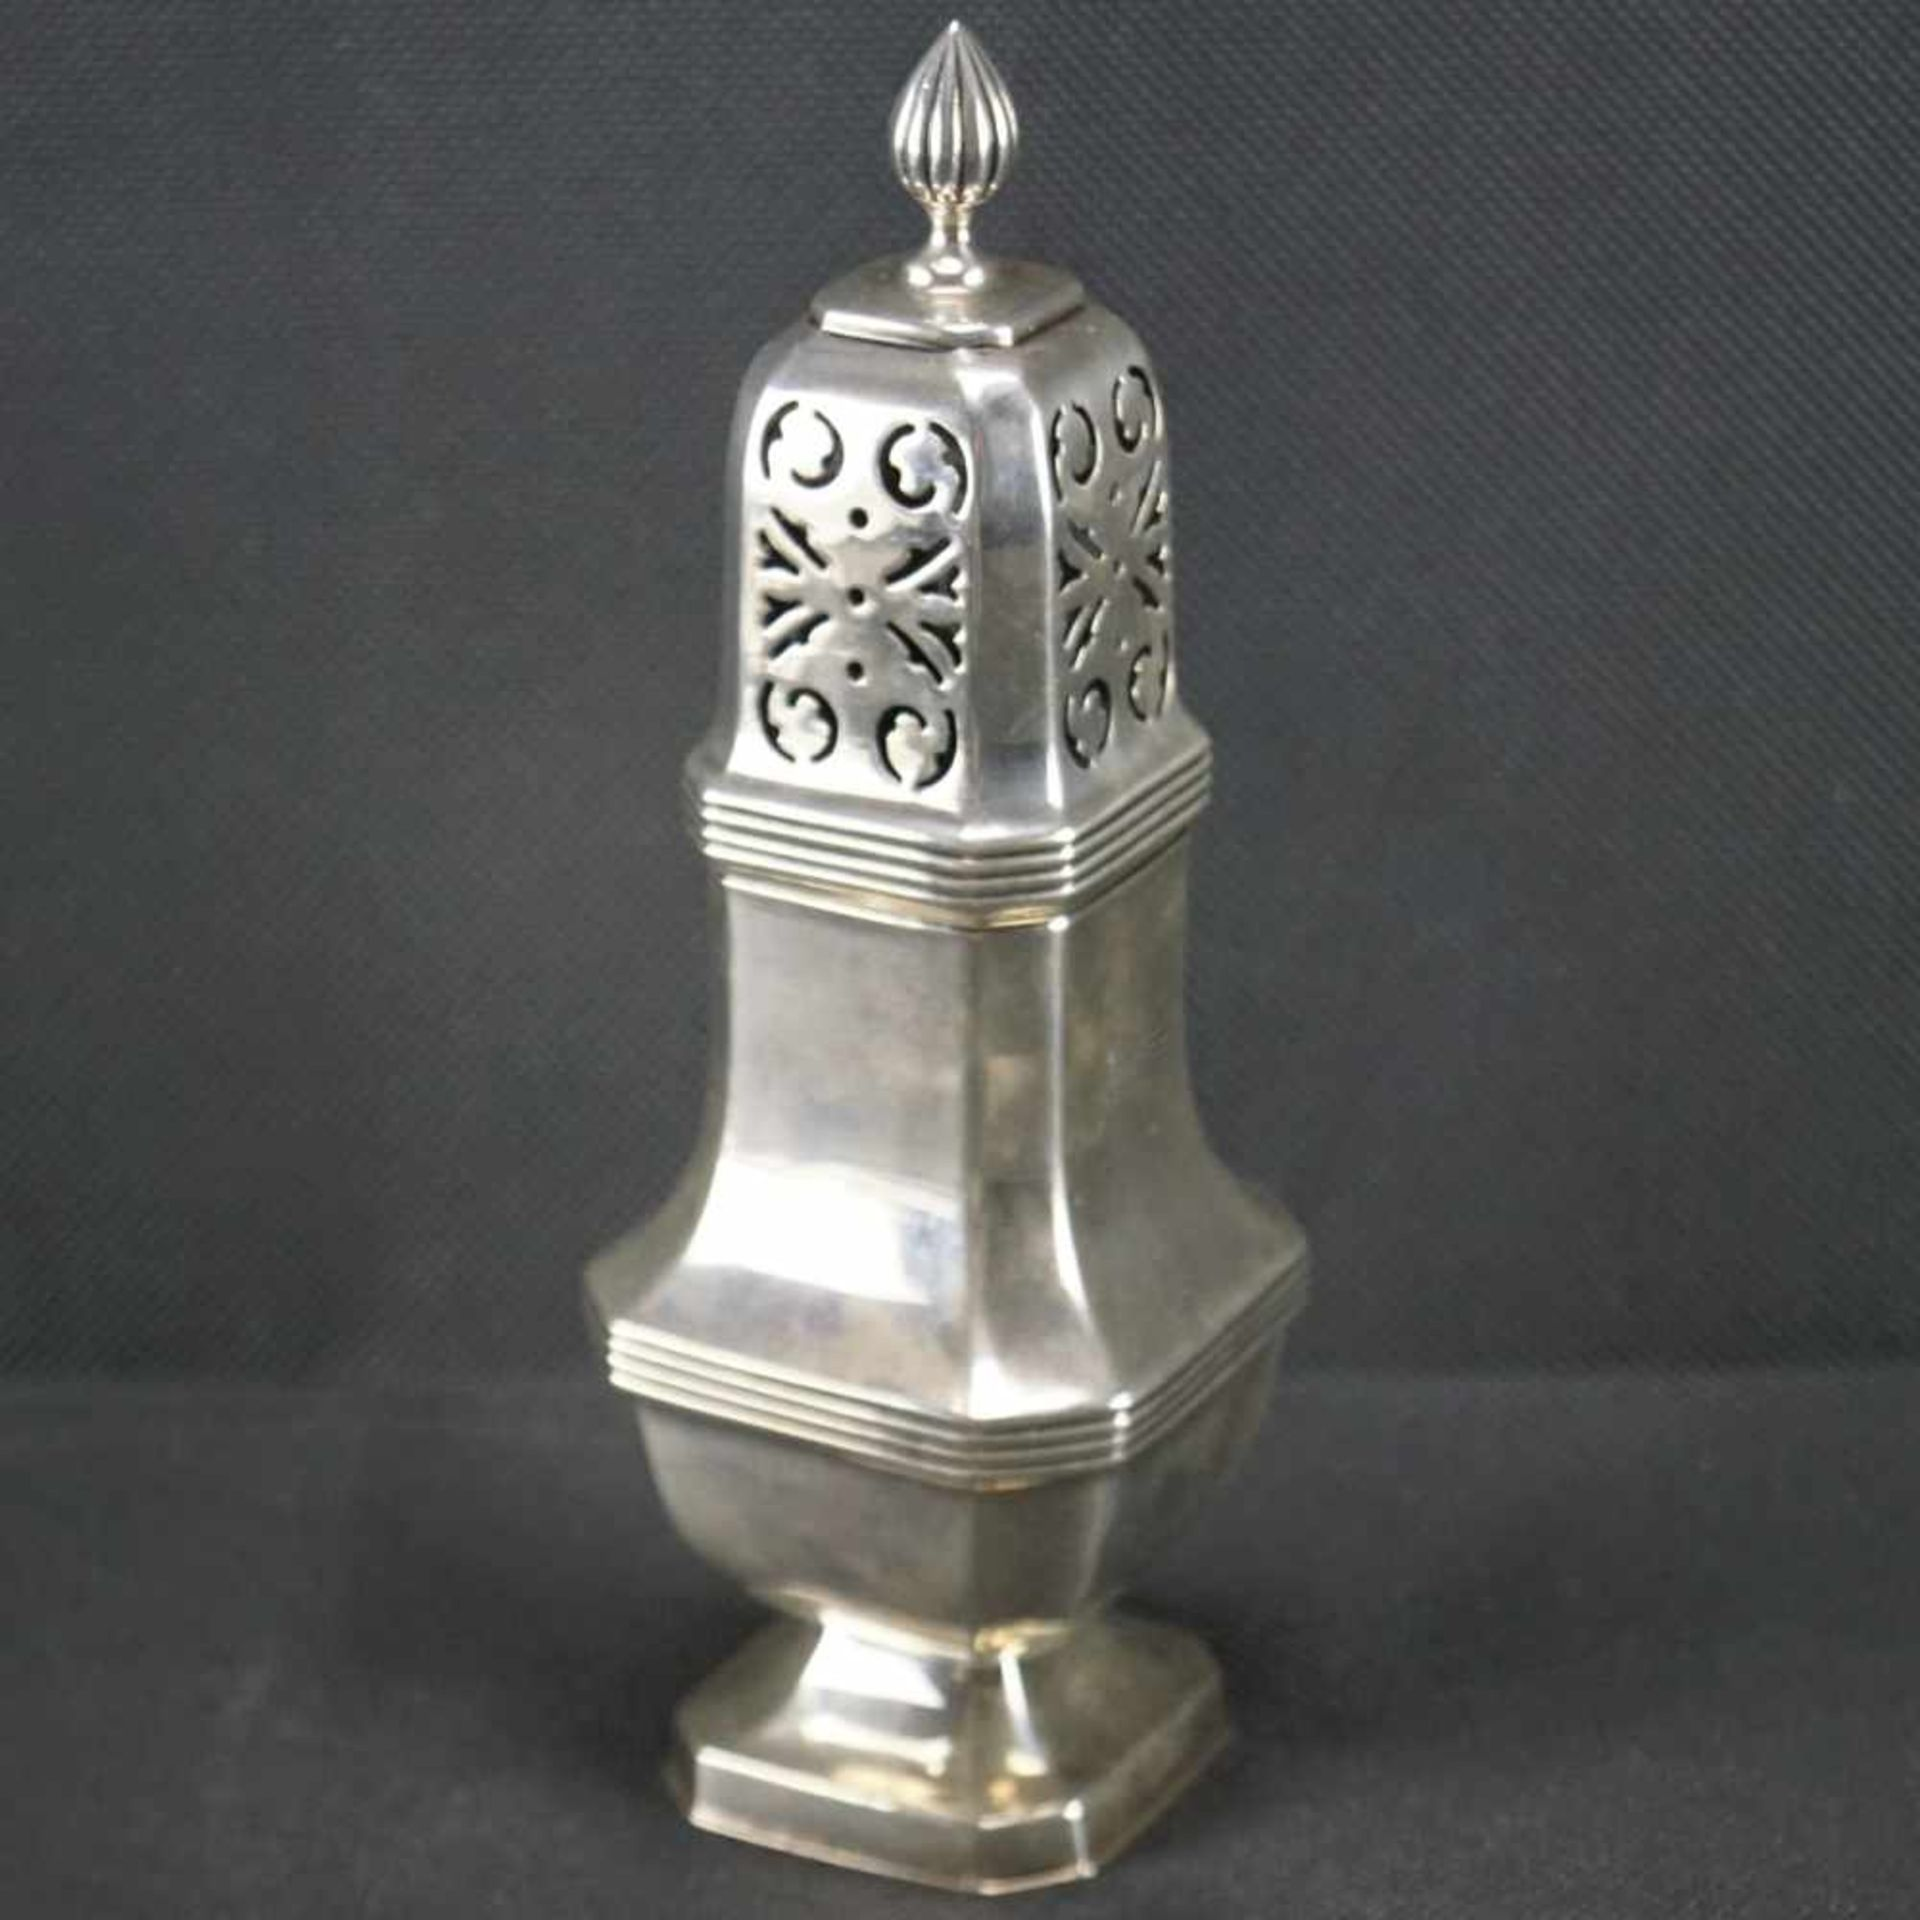 Zuckerstreuer, EnglandSterling Silber, London, Richard Woodman Burbridge, 1936, gepunzt, Höhe 18,5